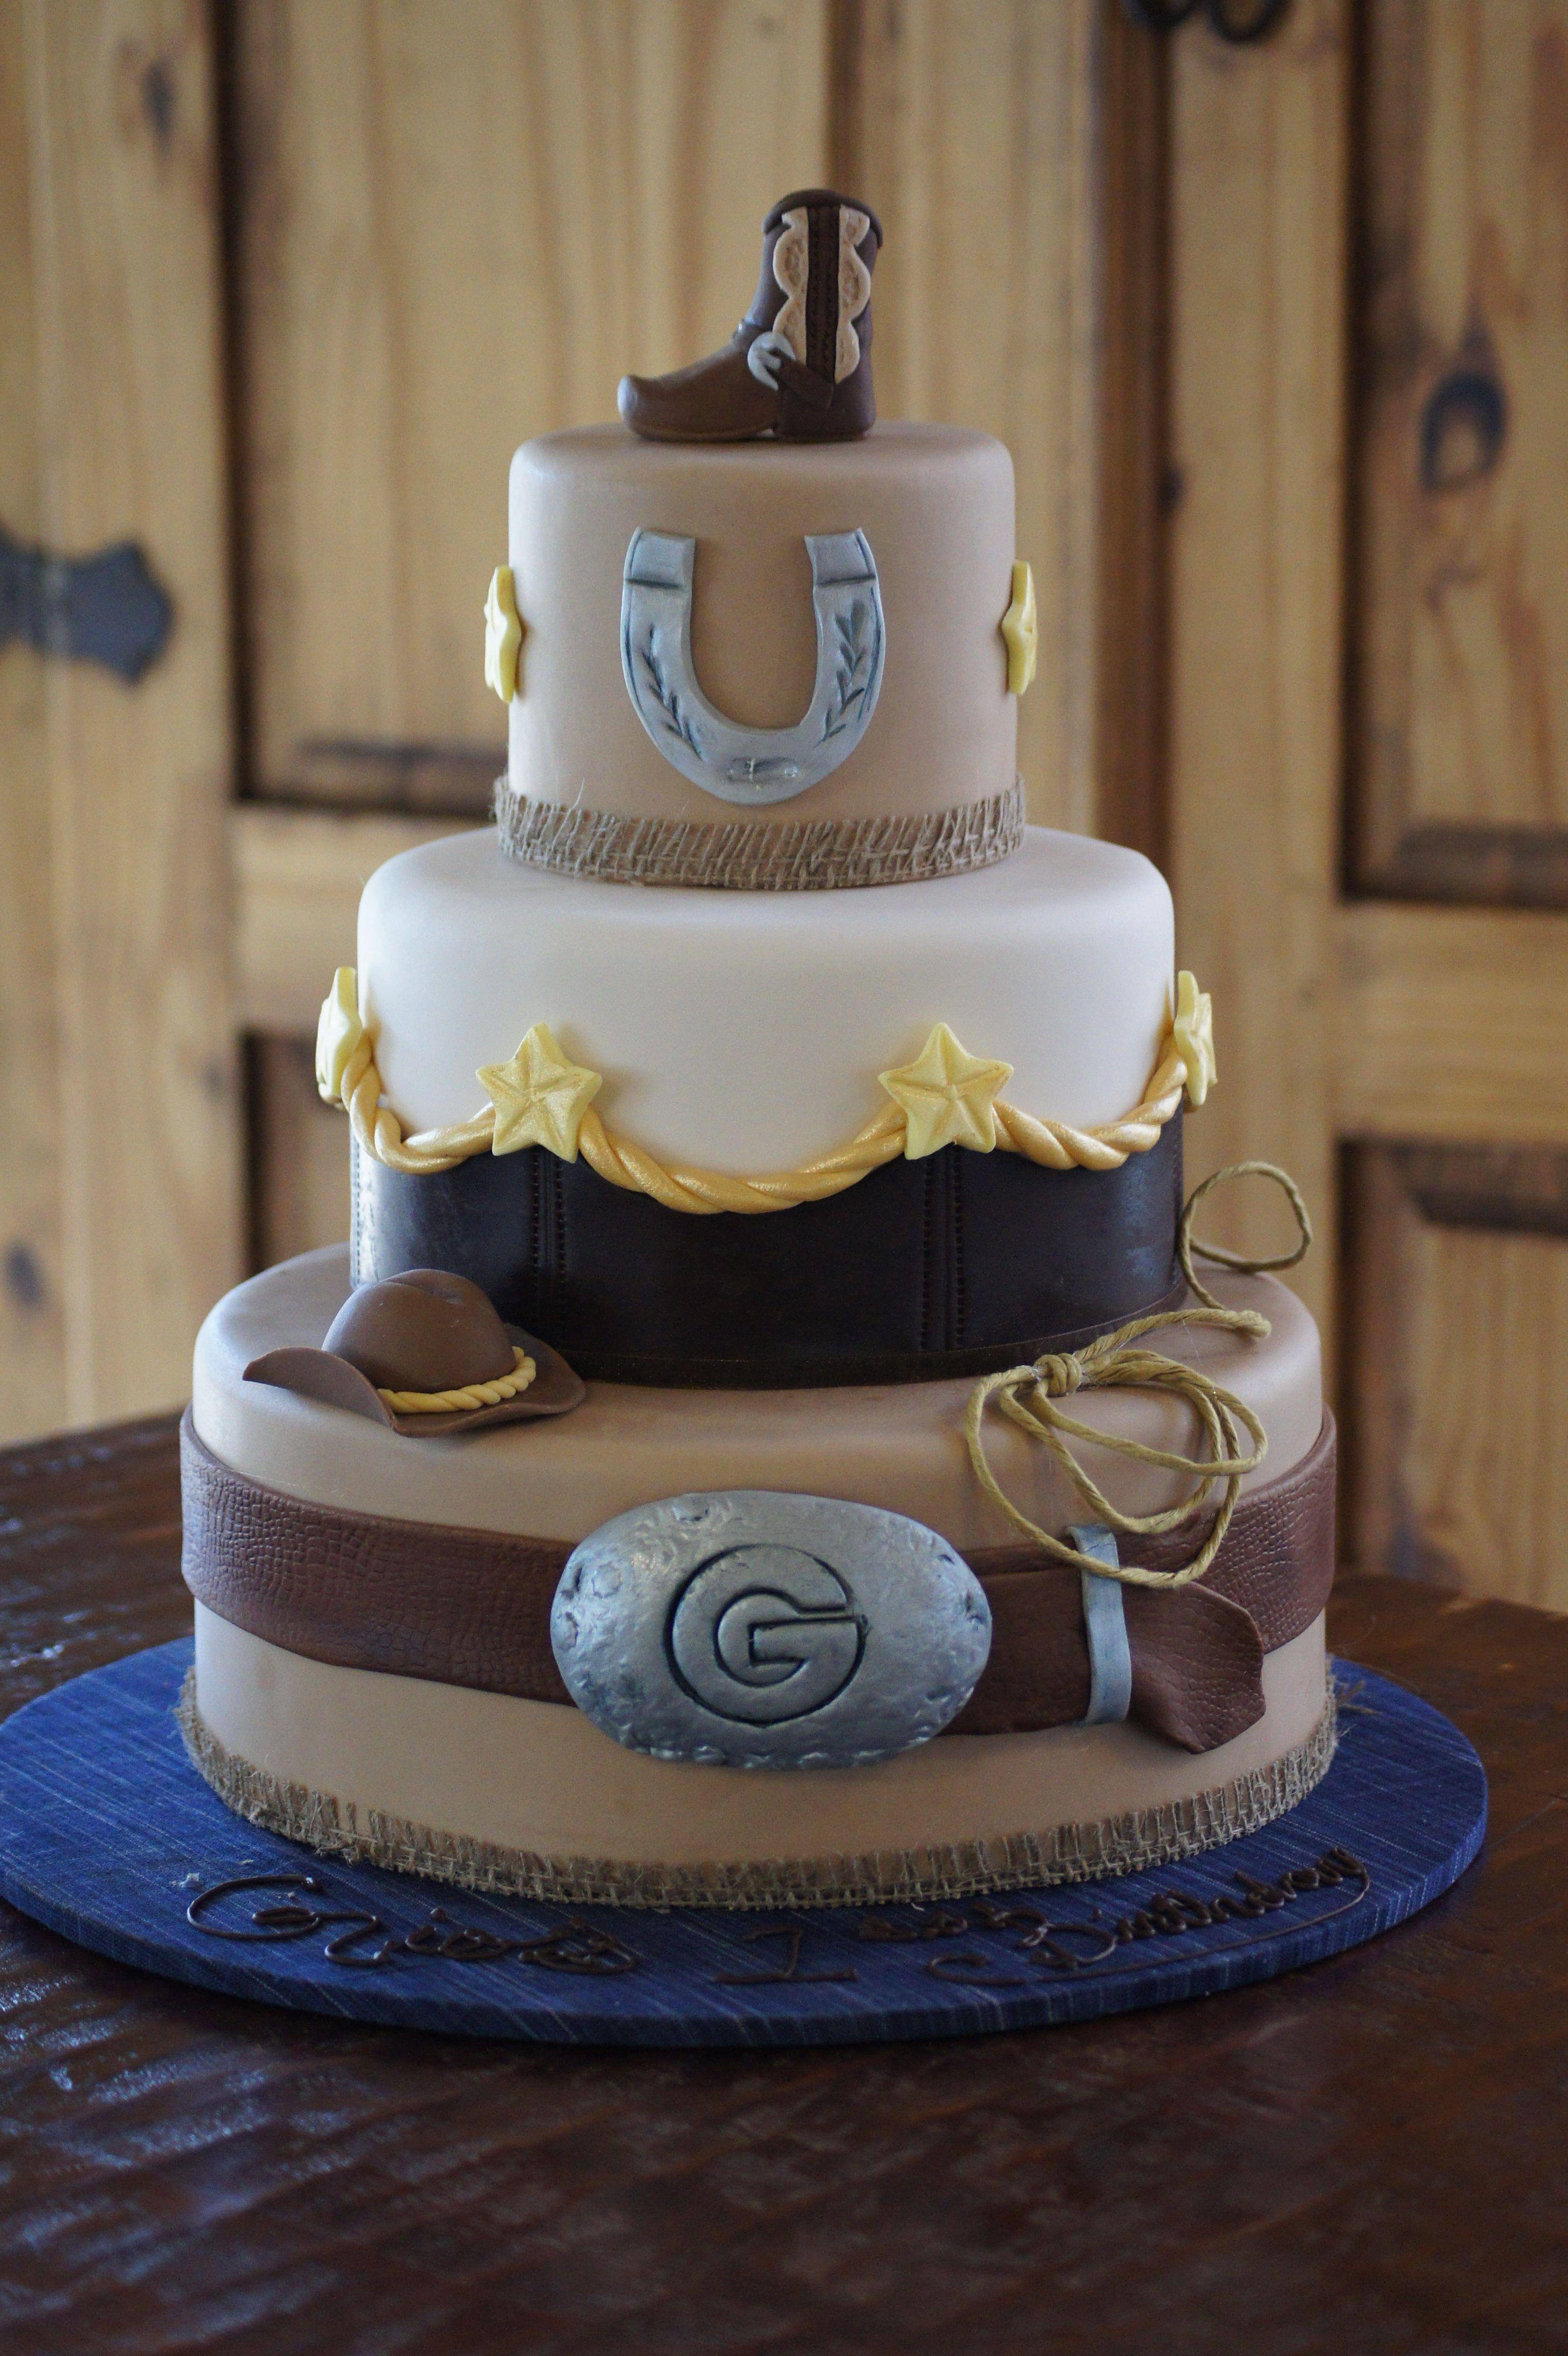 The blue cake company wedding cakes birthday cakes 2016 car release - Fondant Covered Wild West Cowboy Themed Cake Cowboy Partycowboy Wedding Cakescowboy Birthday